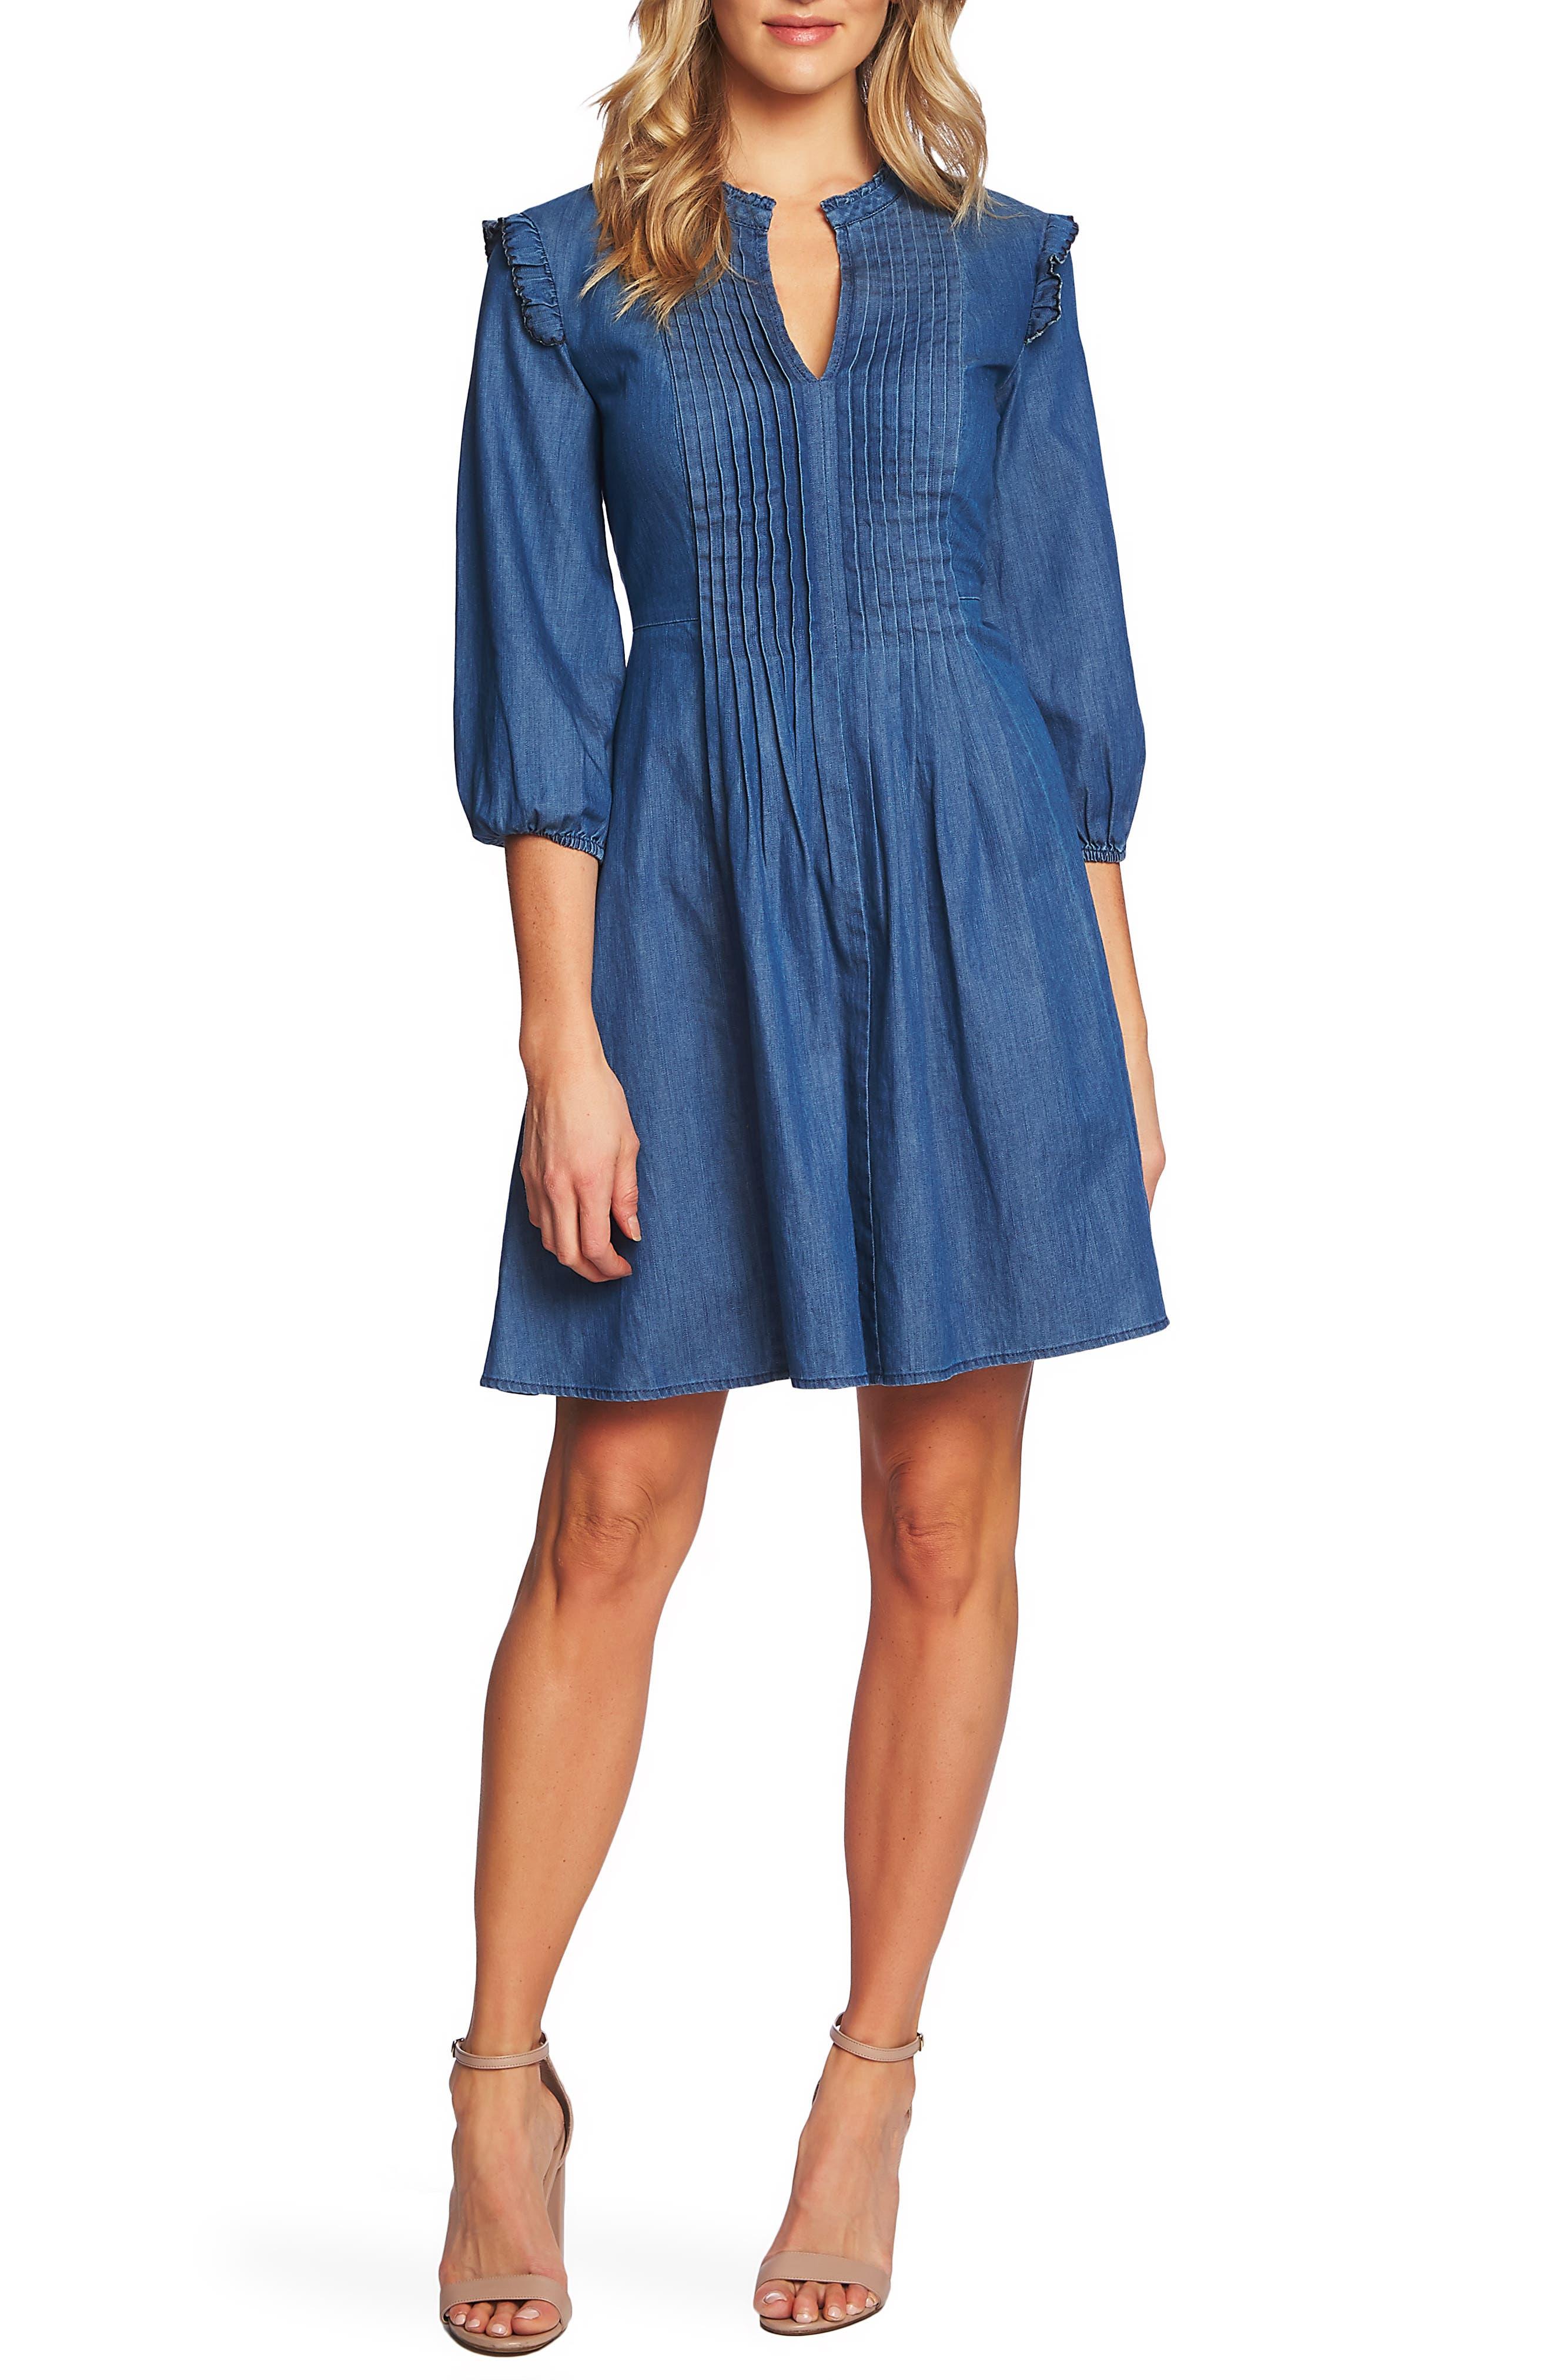 Pintuck Ruffle Denim Dress,                         Main,                         color, AUTHENTIC